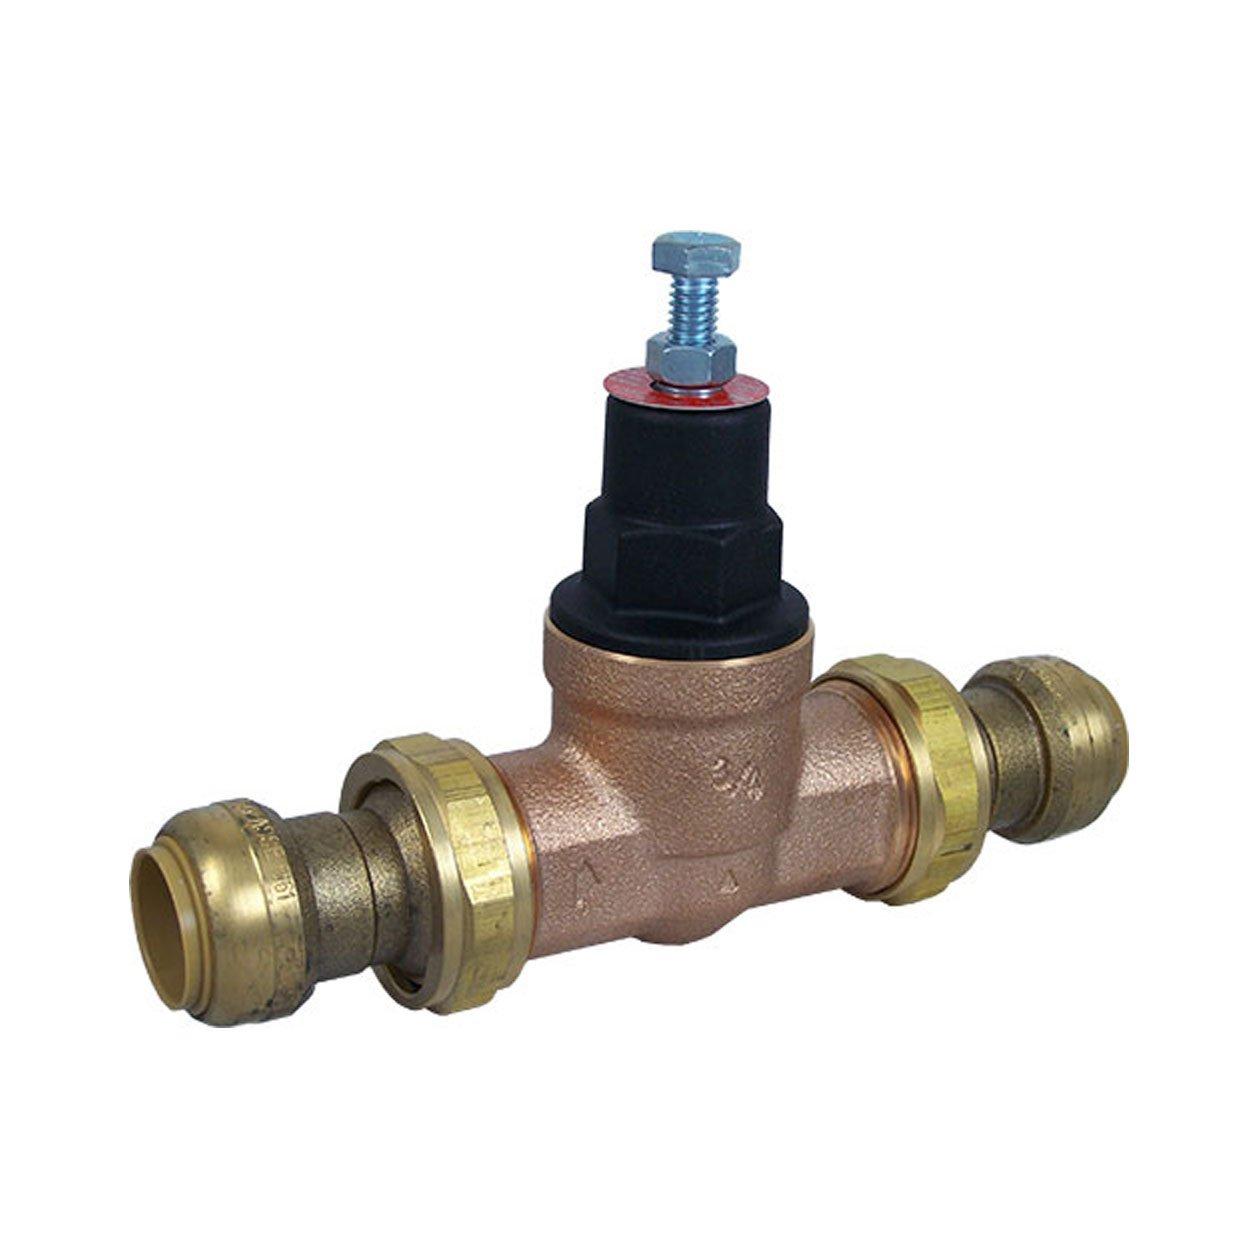 Cash Acme 23885-0045 Eb45-Du 3//4-Inch Double Union Threaded Pressure Regulating Valve Lead Free